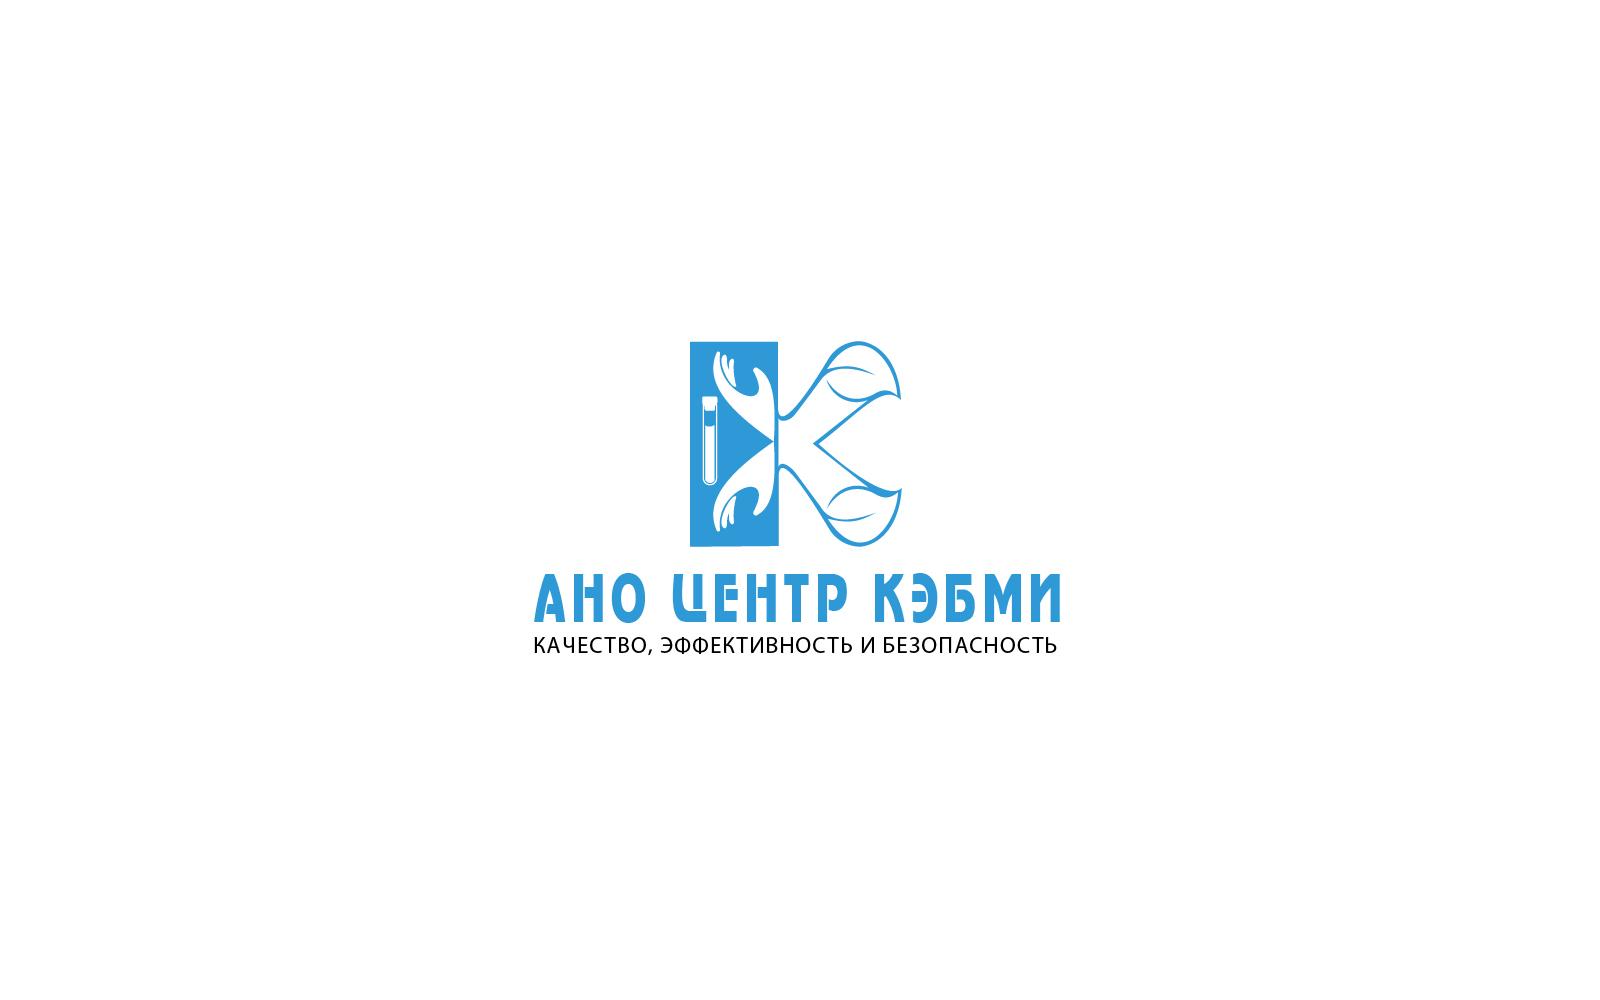 Редизайн логотипа АНО Центр КЭБМИ - BREVIS фото f_0465b1b90574bef7.jpg